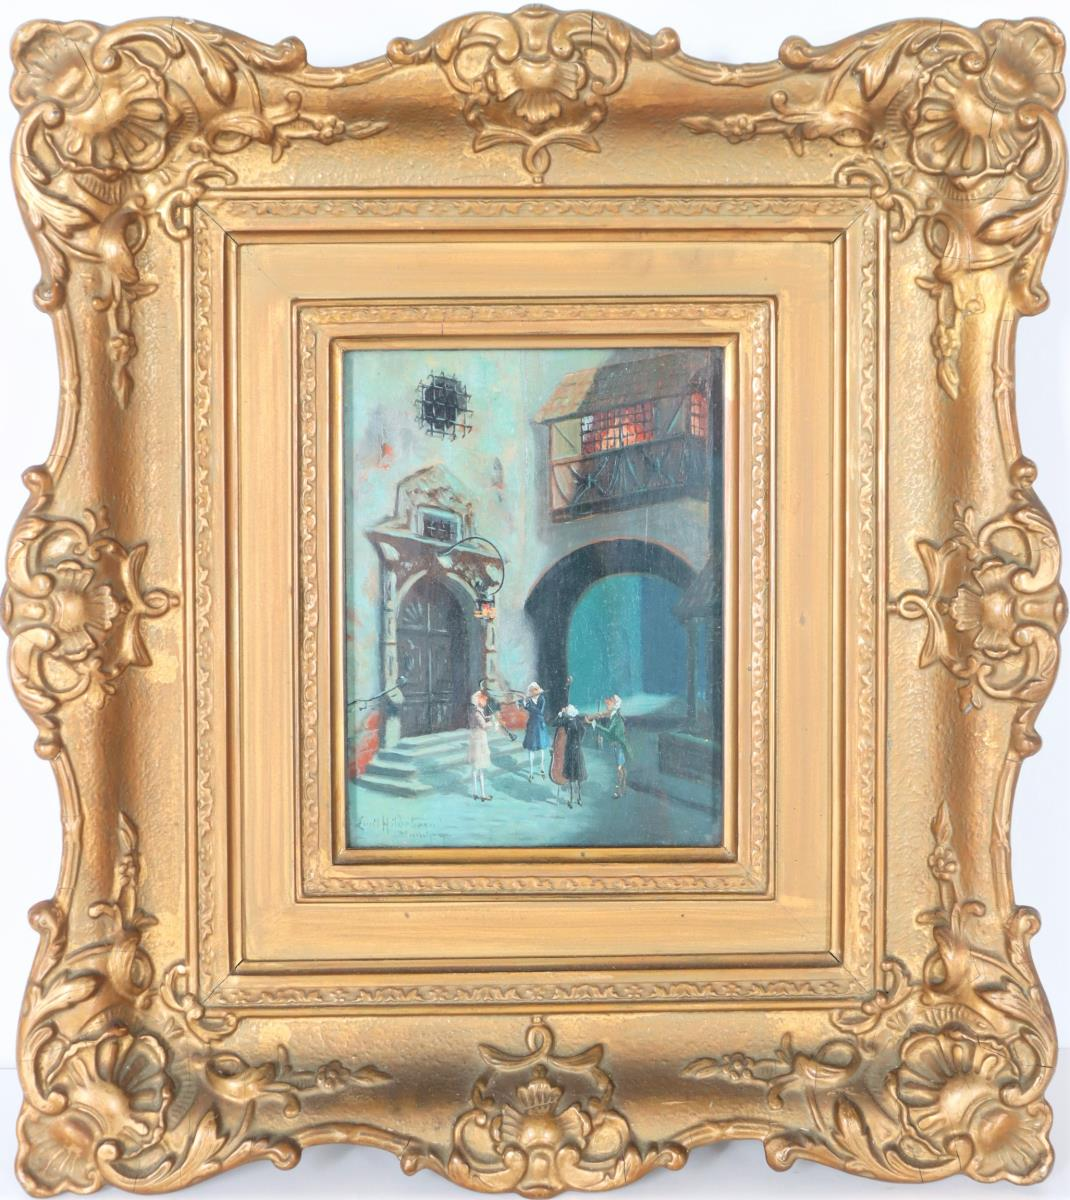 Emil Hildebrand (19th C.) German, Oil on Board - Image 2 of 4